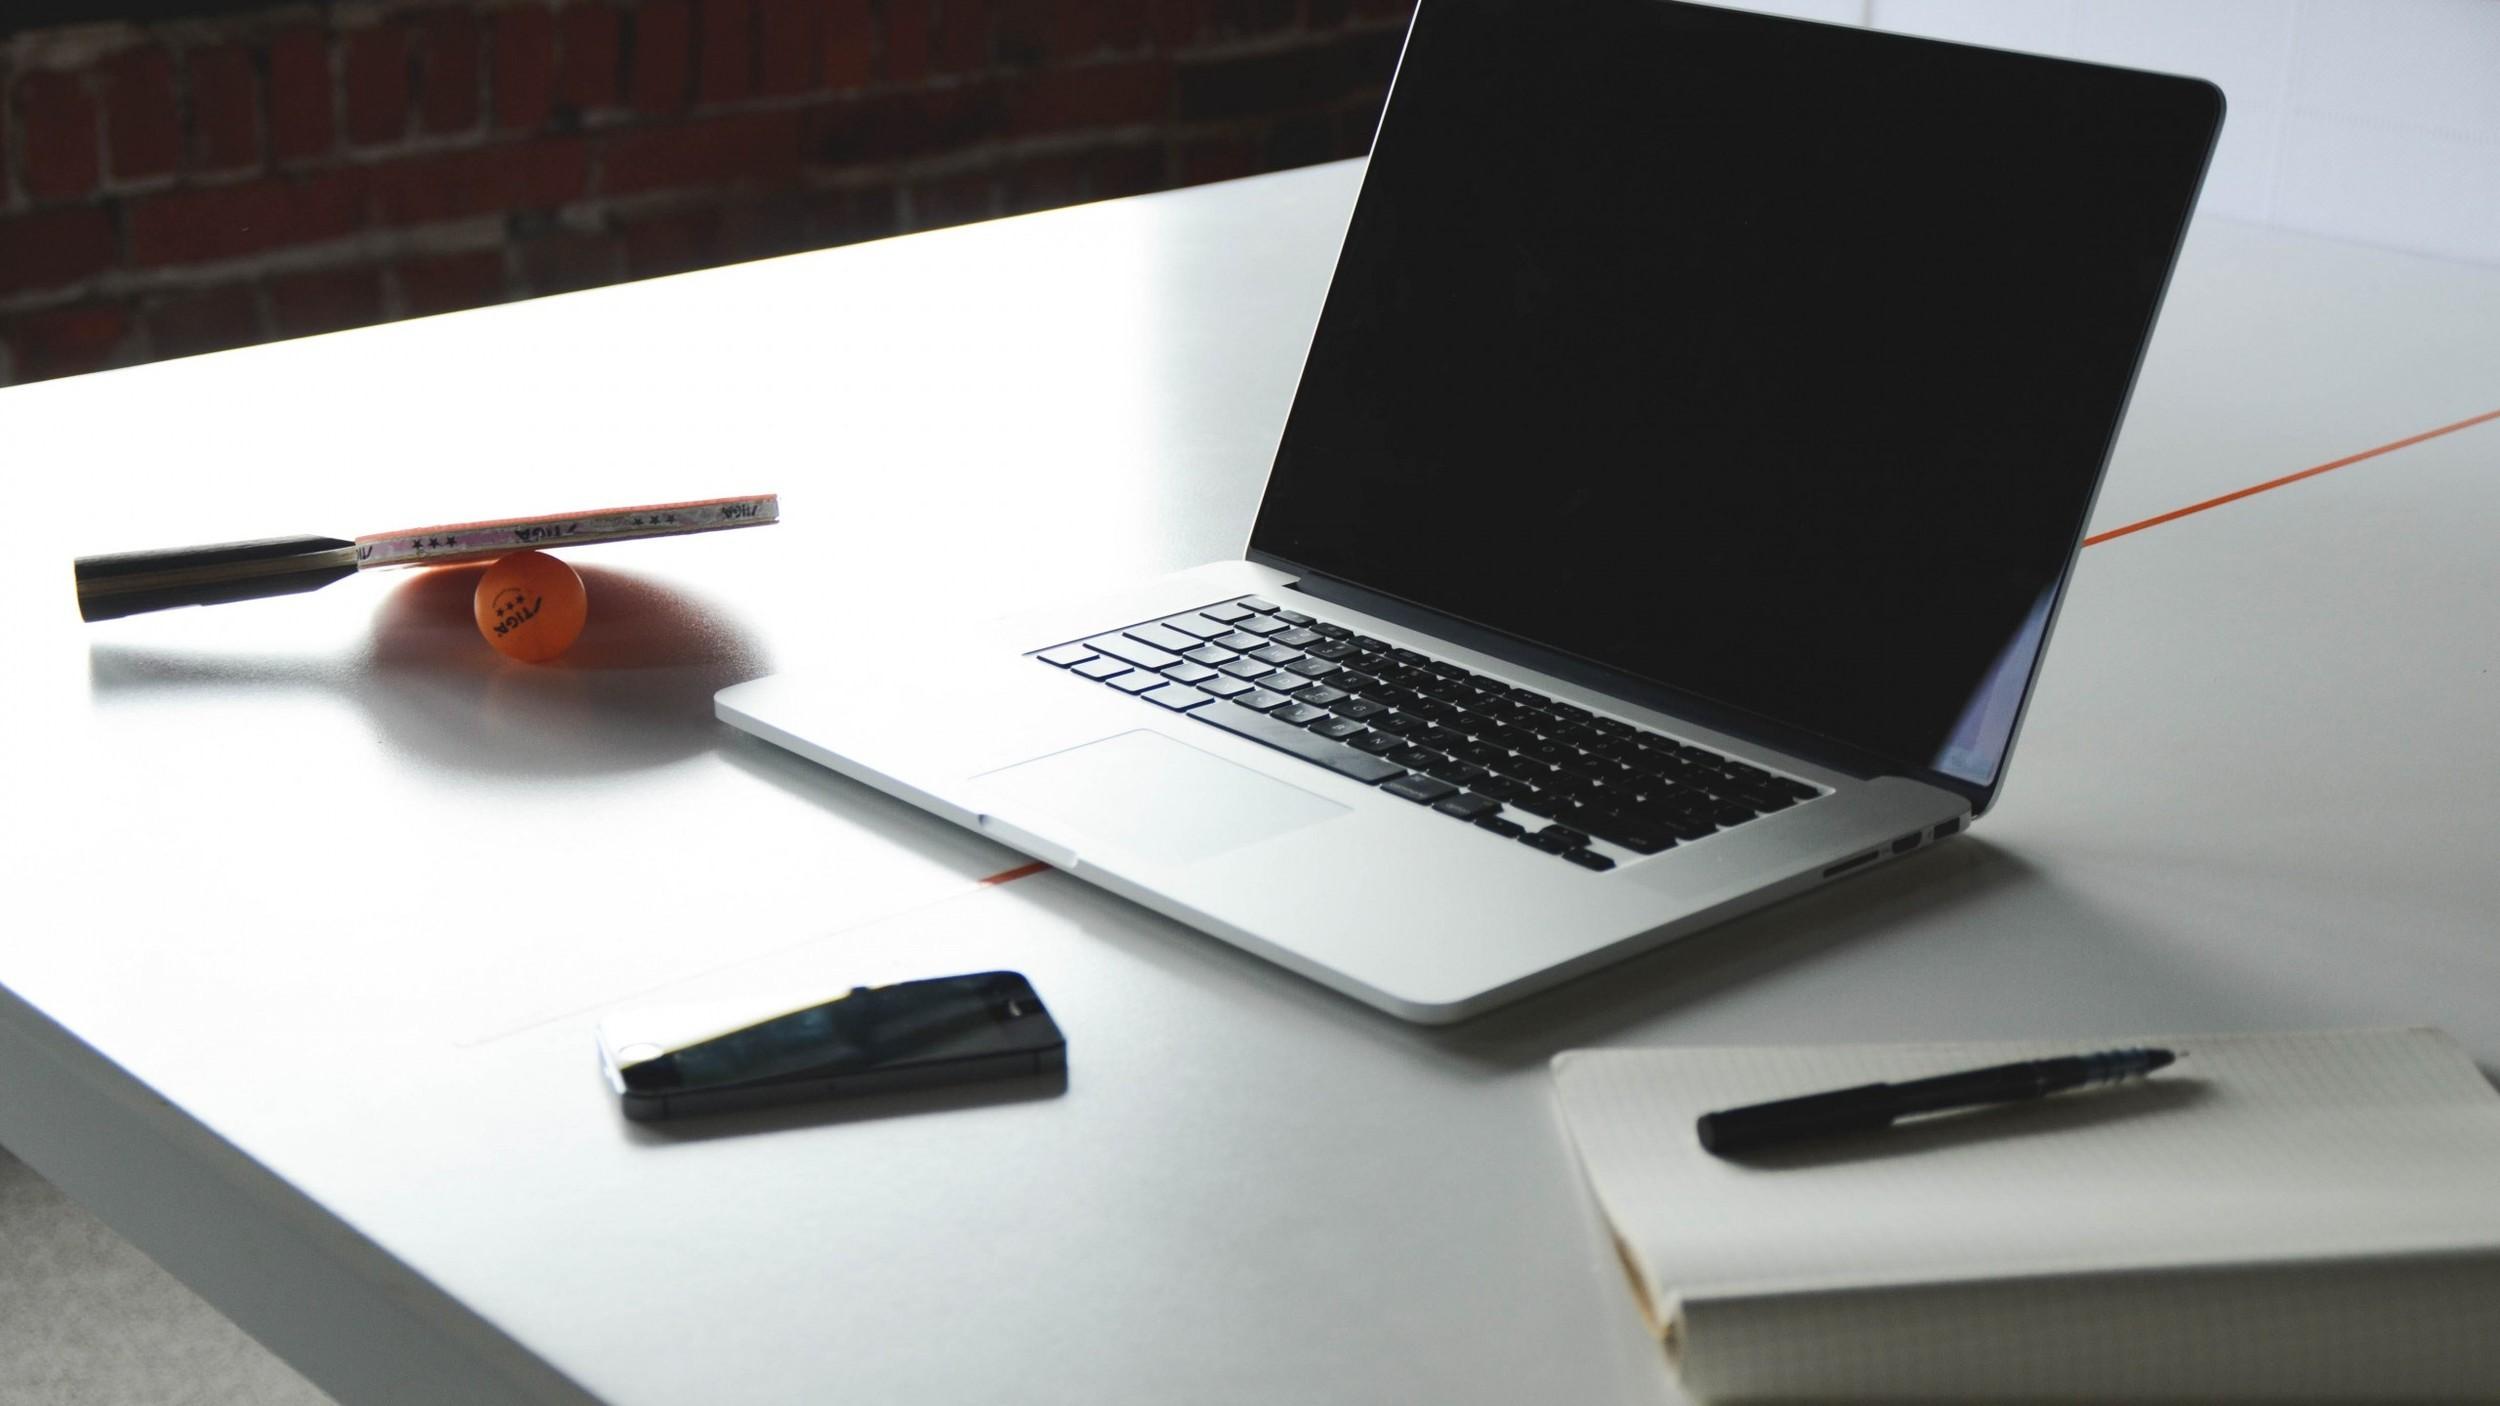 عوامل موثر بر نویز ADSL چیست؟ بخش سوم